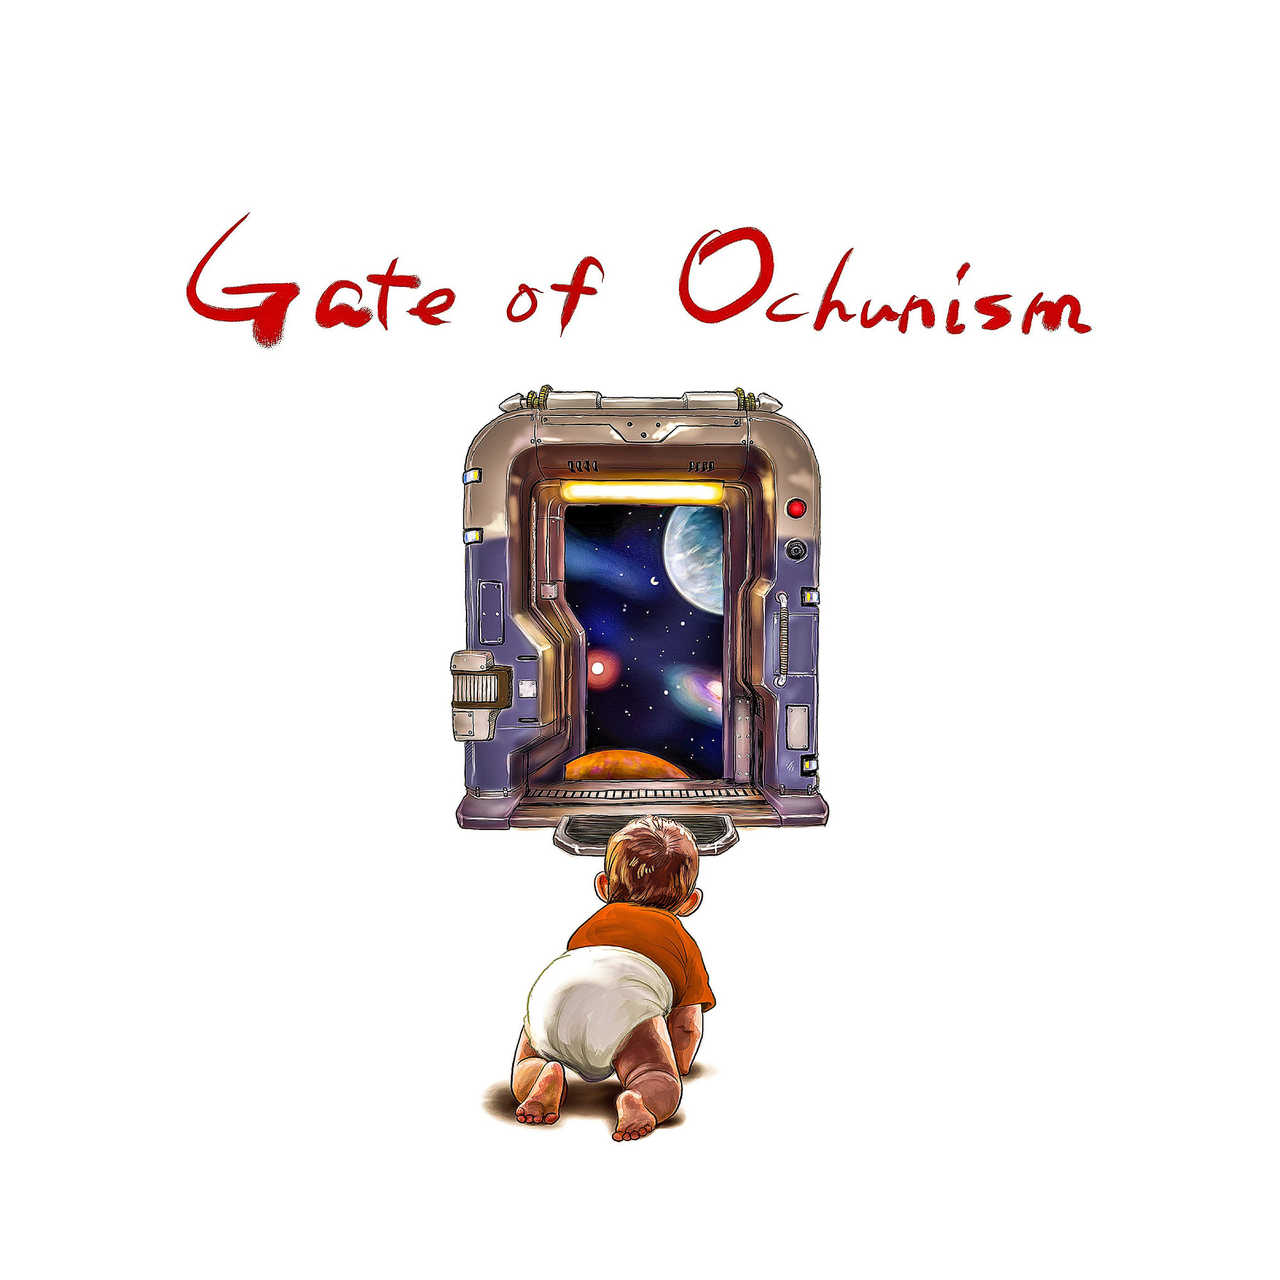 Ochunismの初全国流通盤「Gate of Ochunism」全曲トレイラーを公開